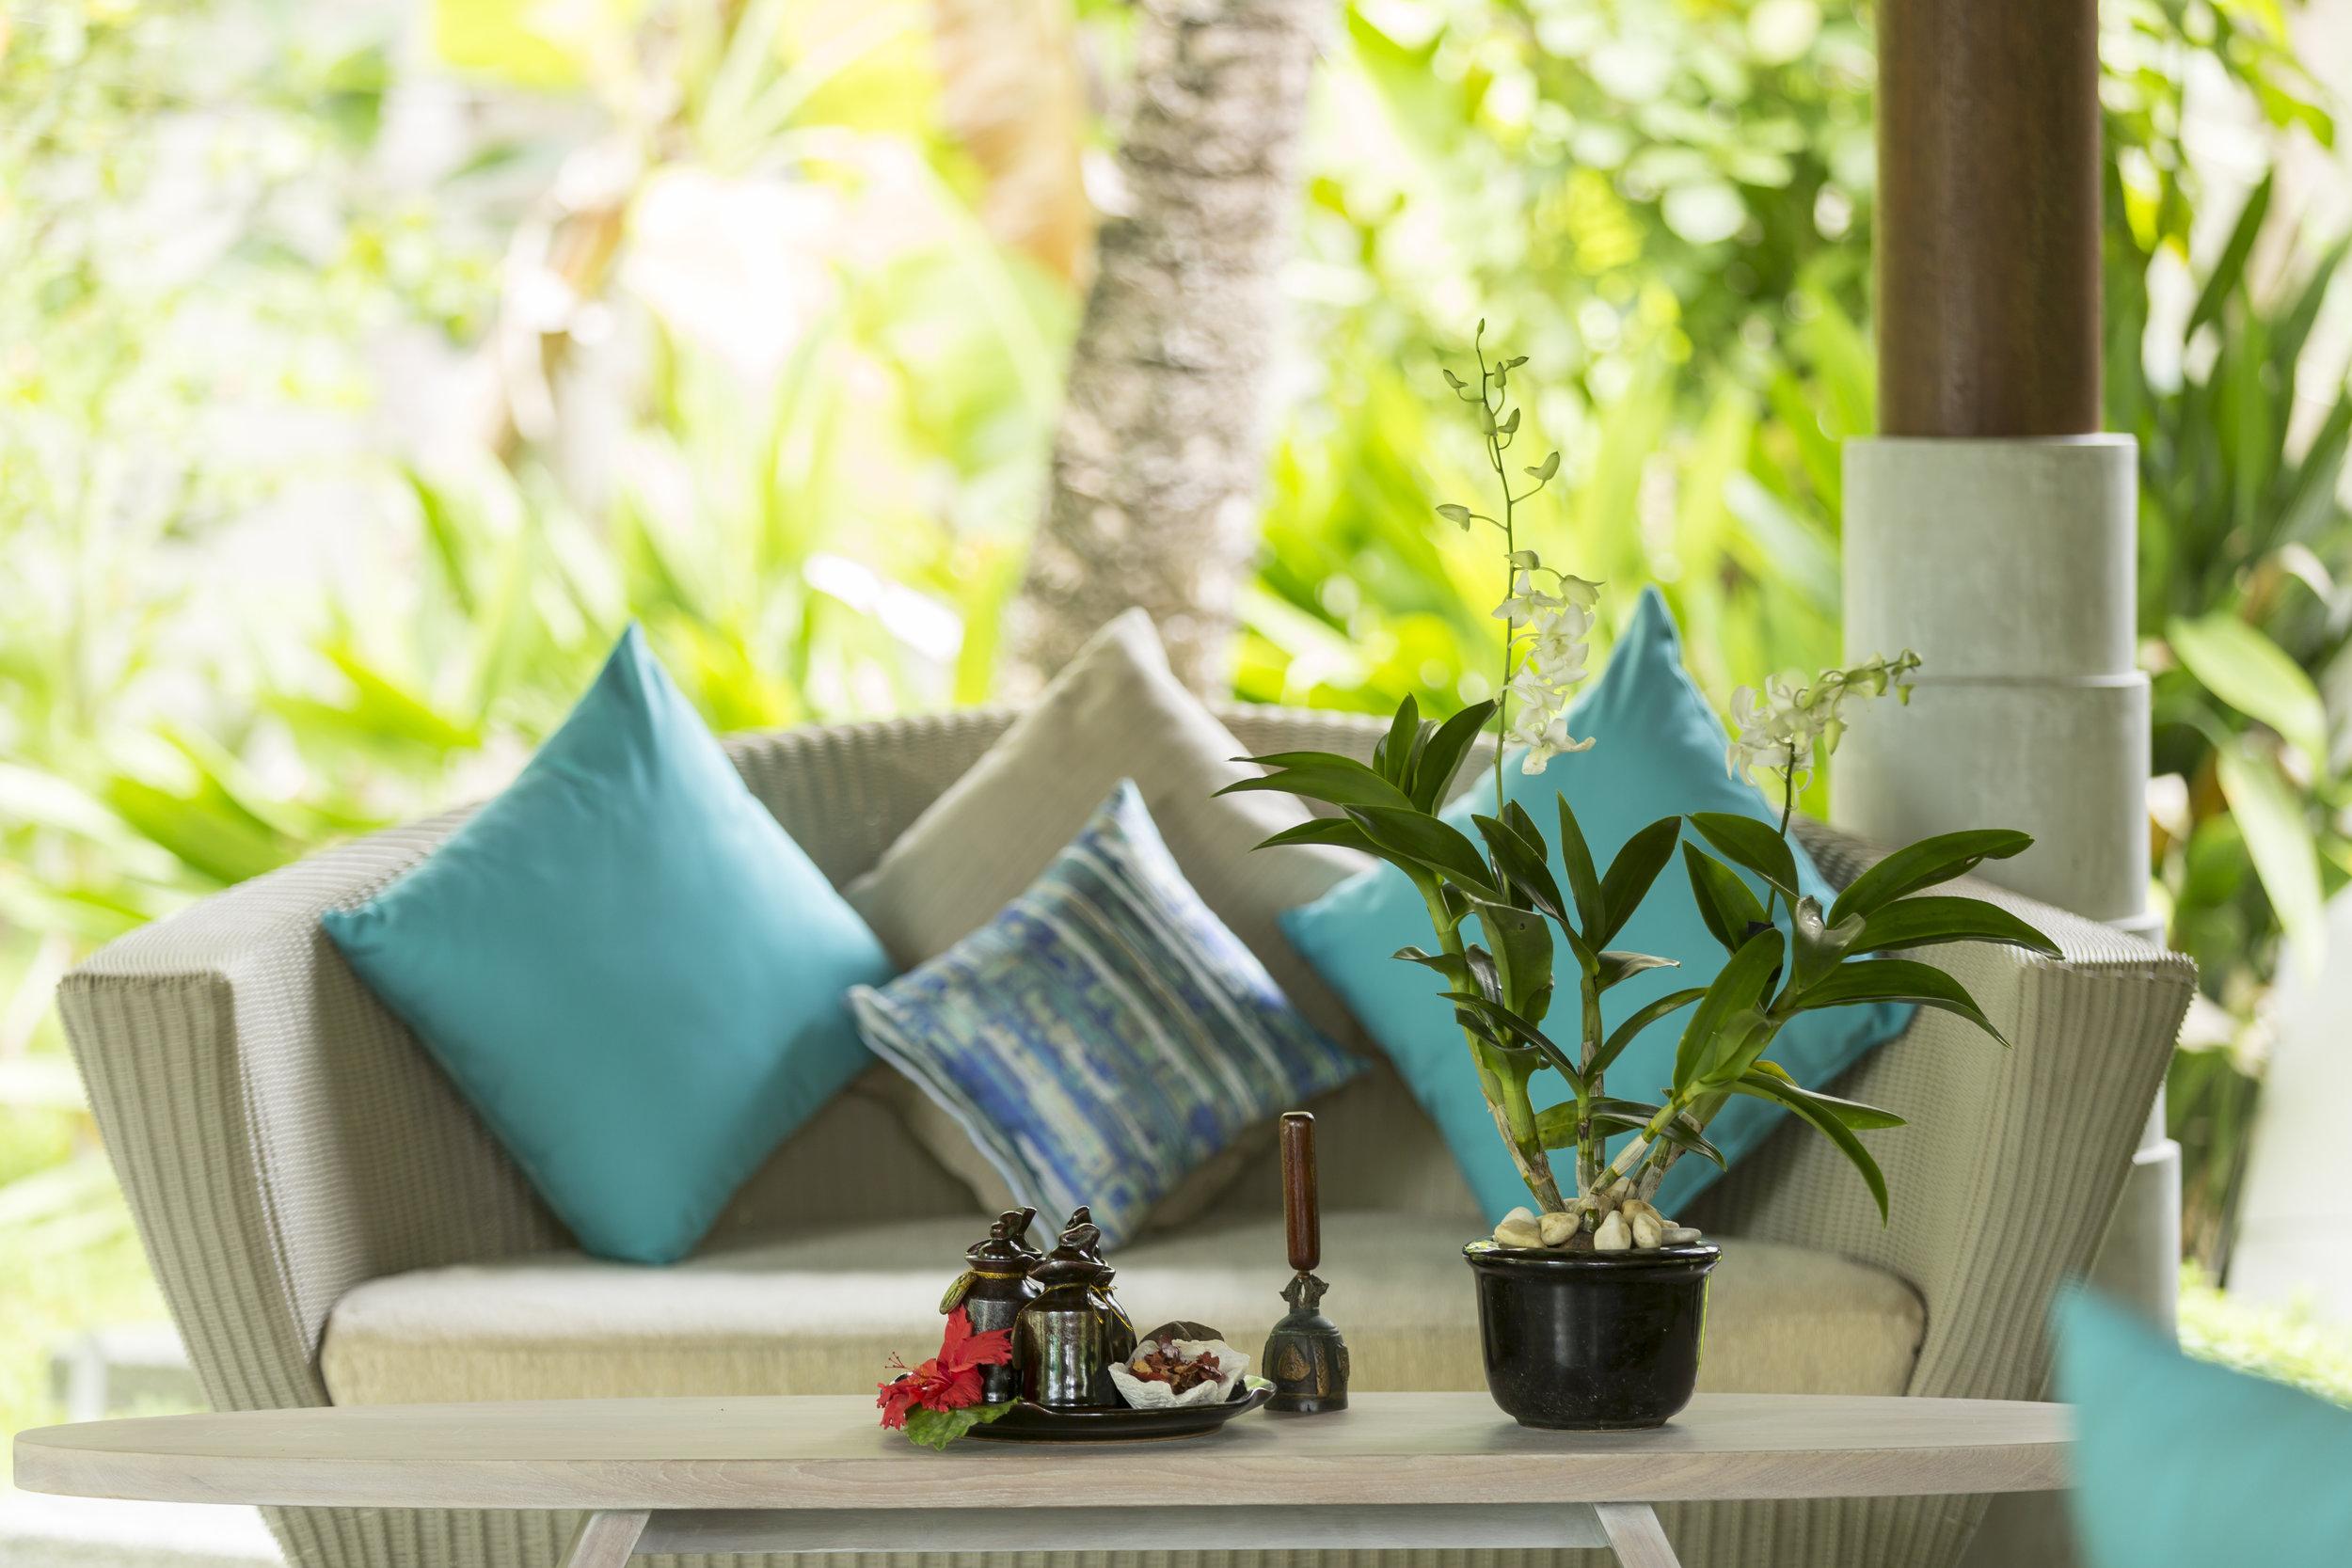 Ananatara_Veli_Balance_Wellness_Entrance_Detail_Couch.jpg